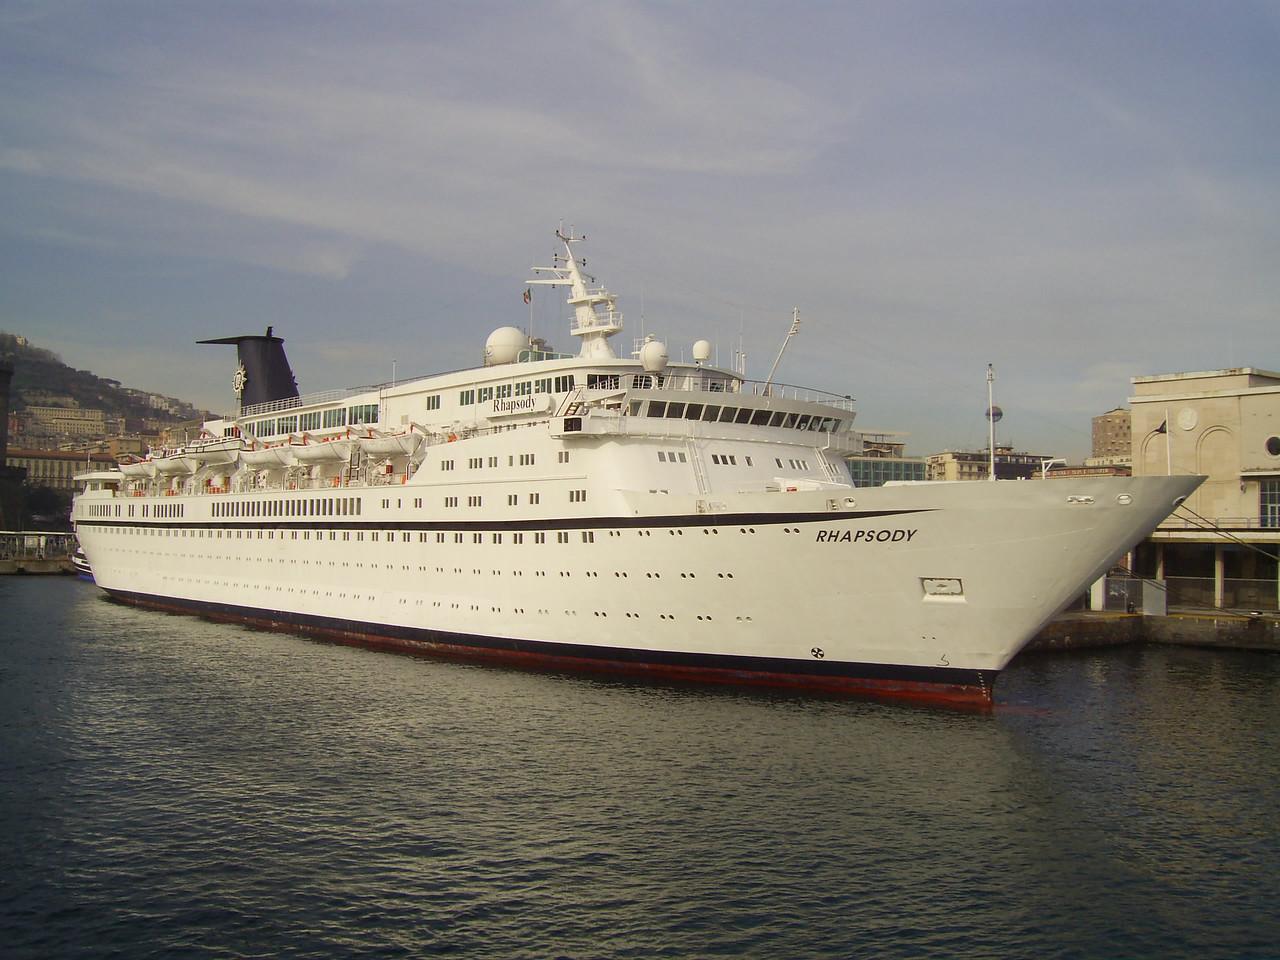 2007 - M/S RHAPSODY in Napoli.